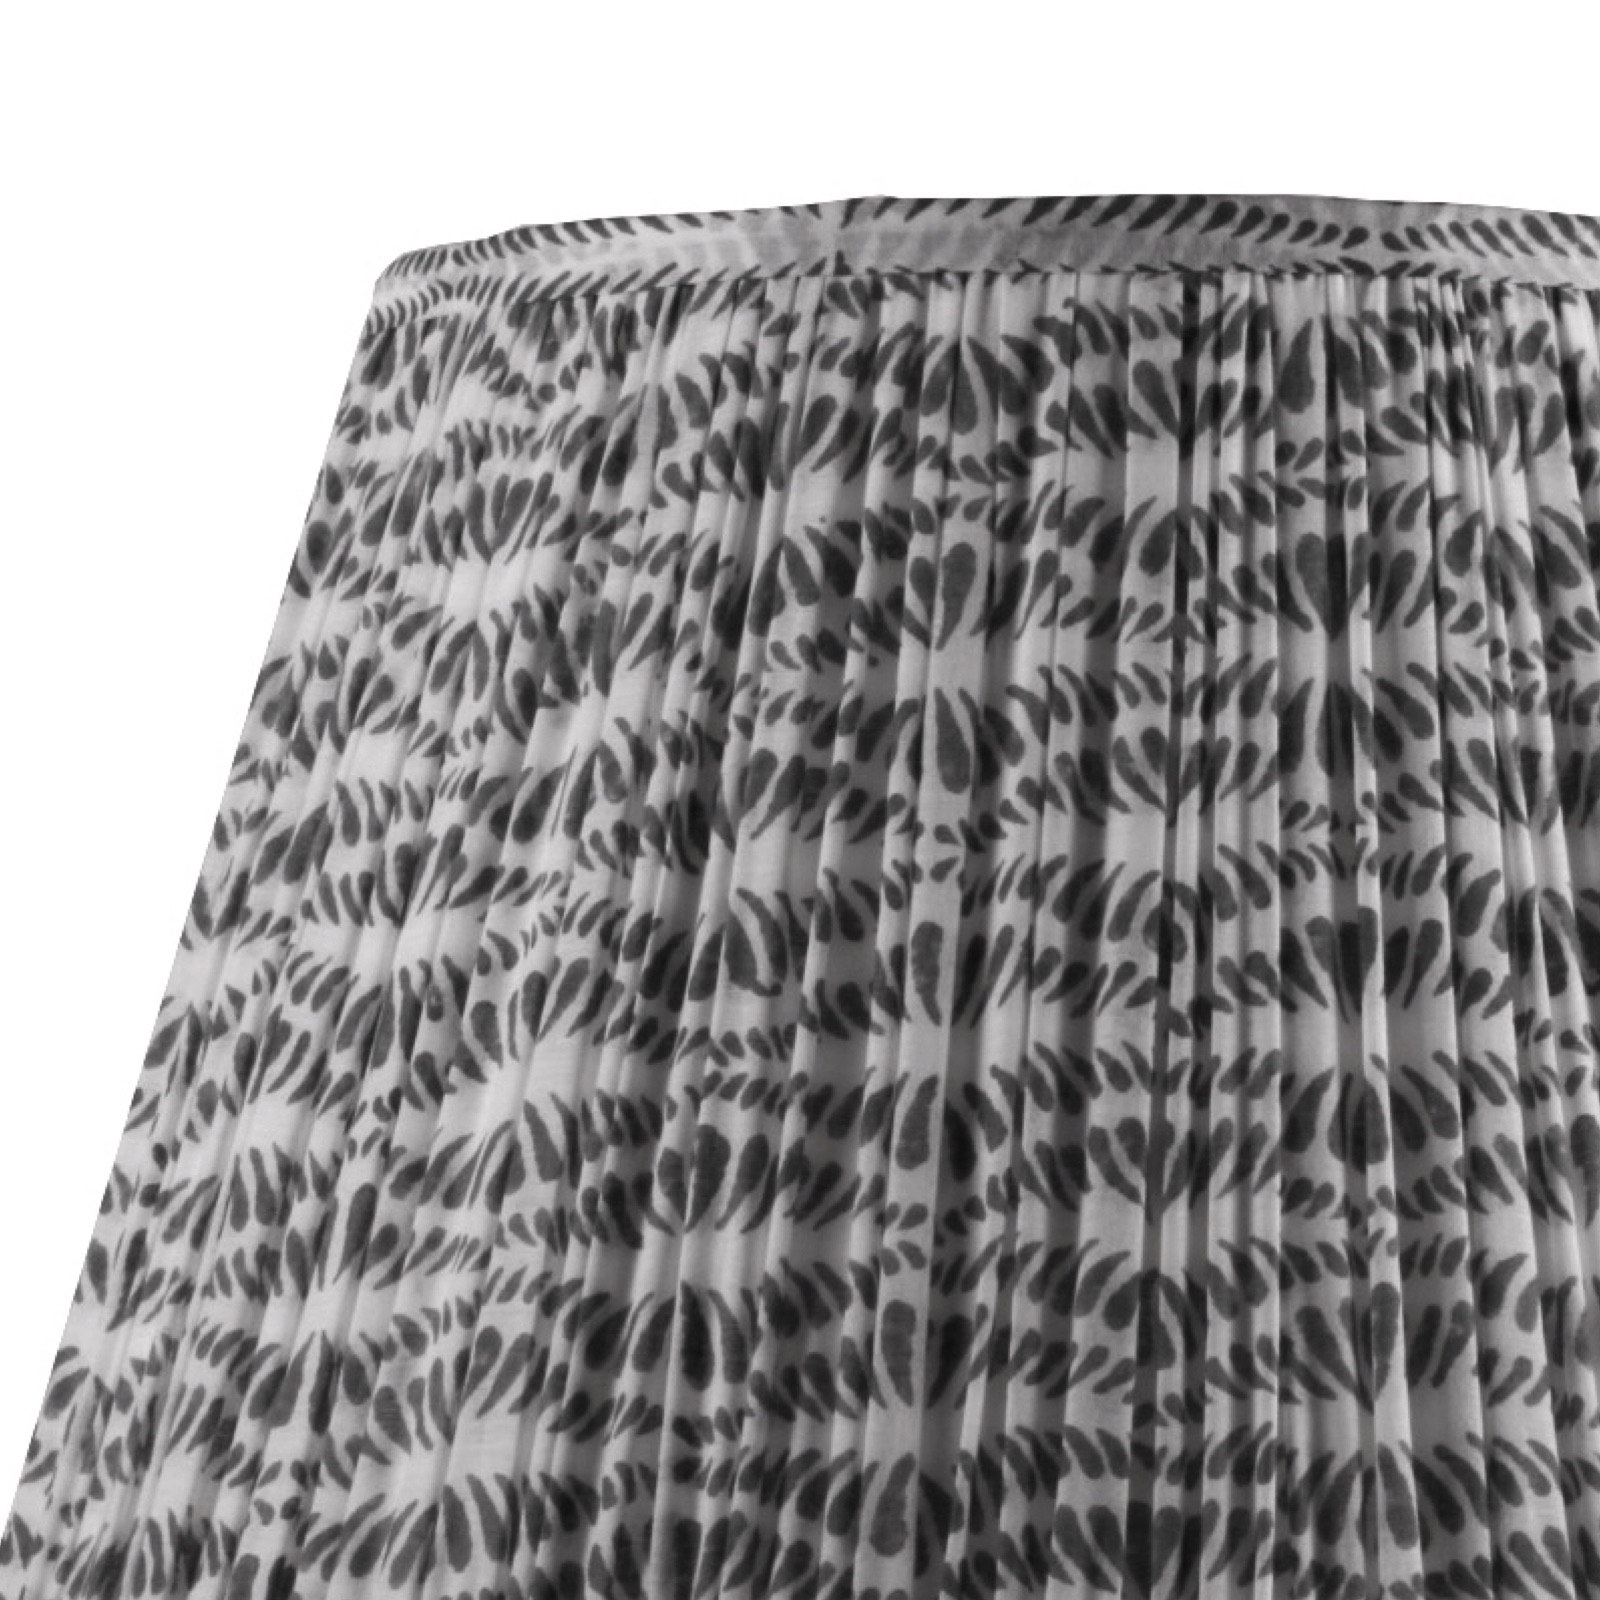 Grey & White | Detail | Low Res